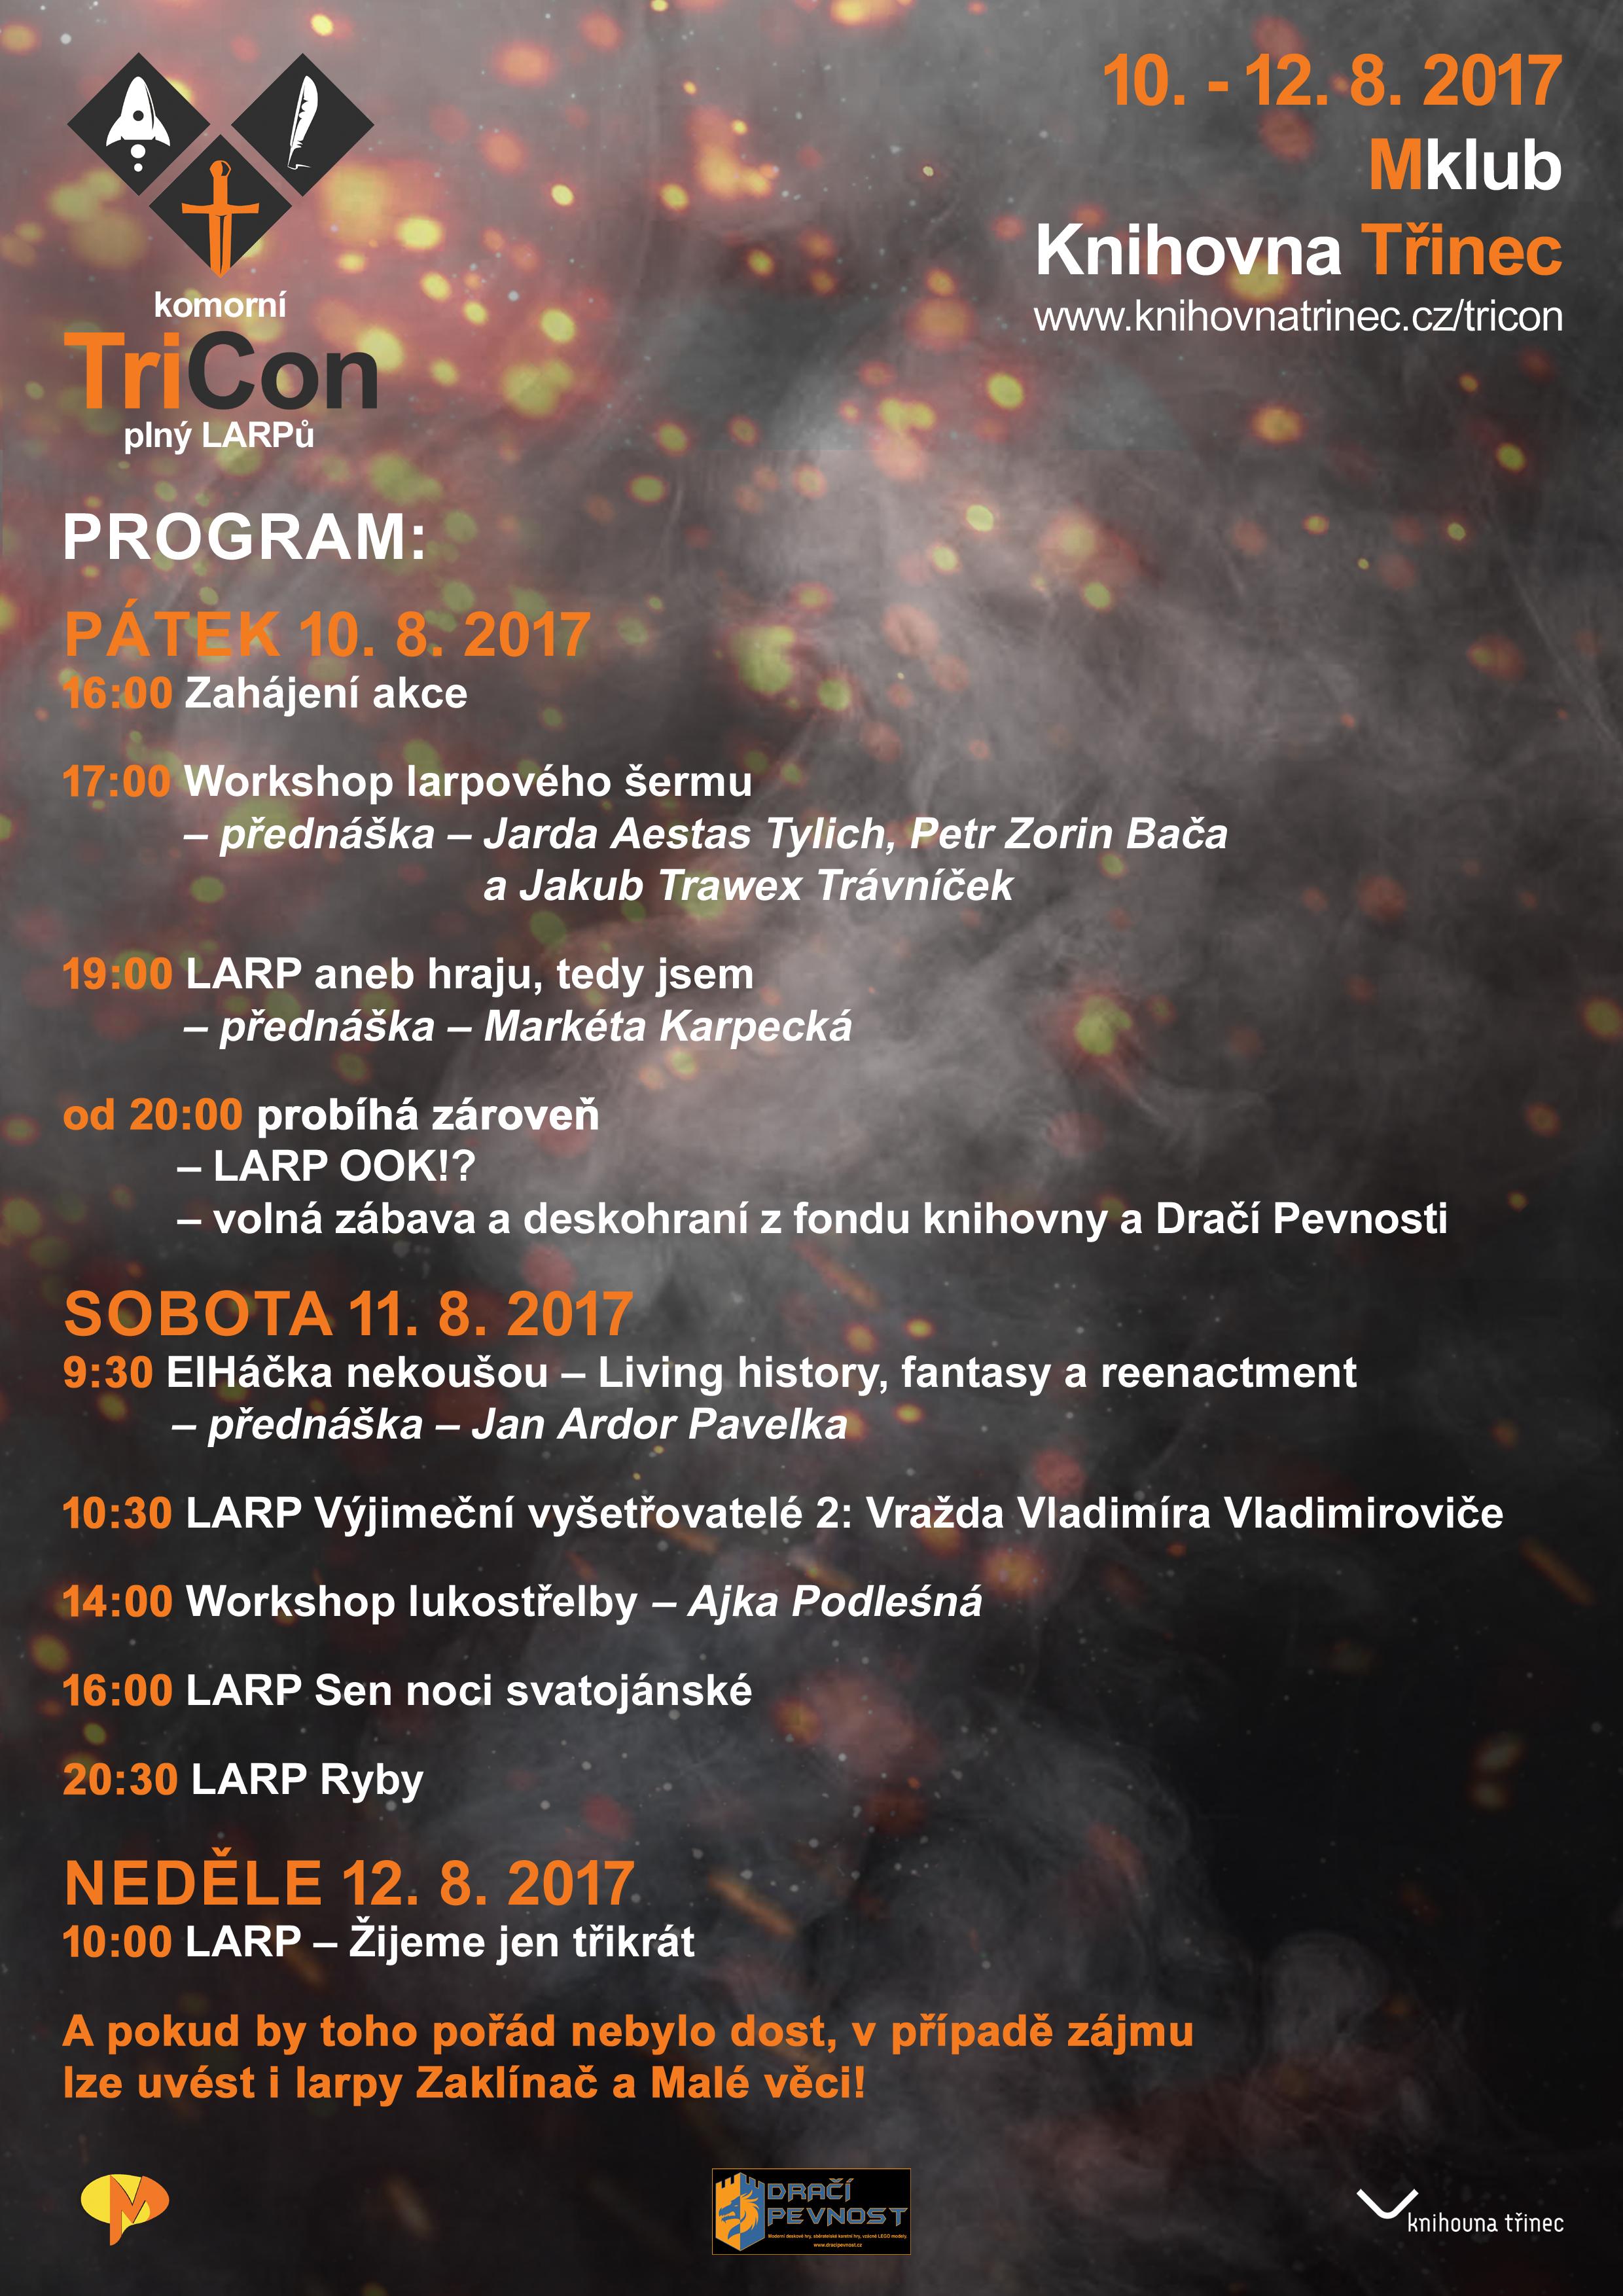 TriCon plný LARPů program WEB (1)